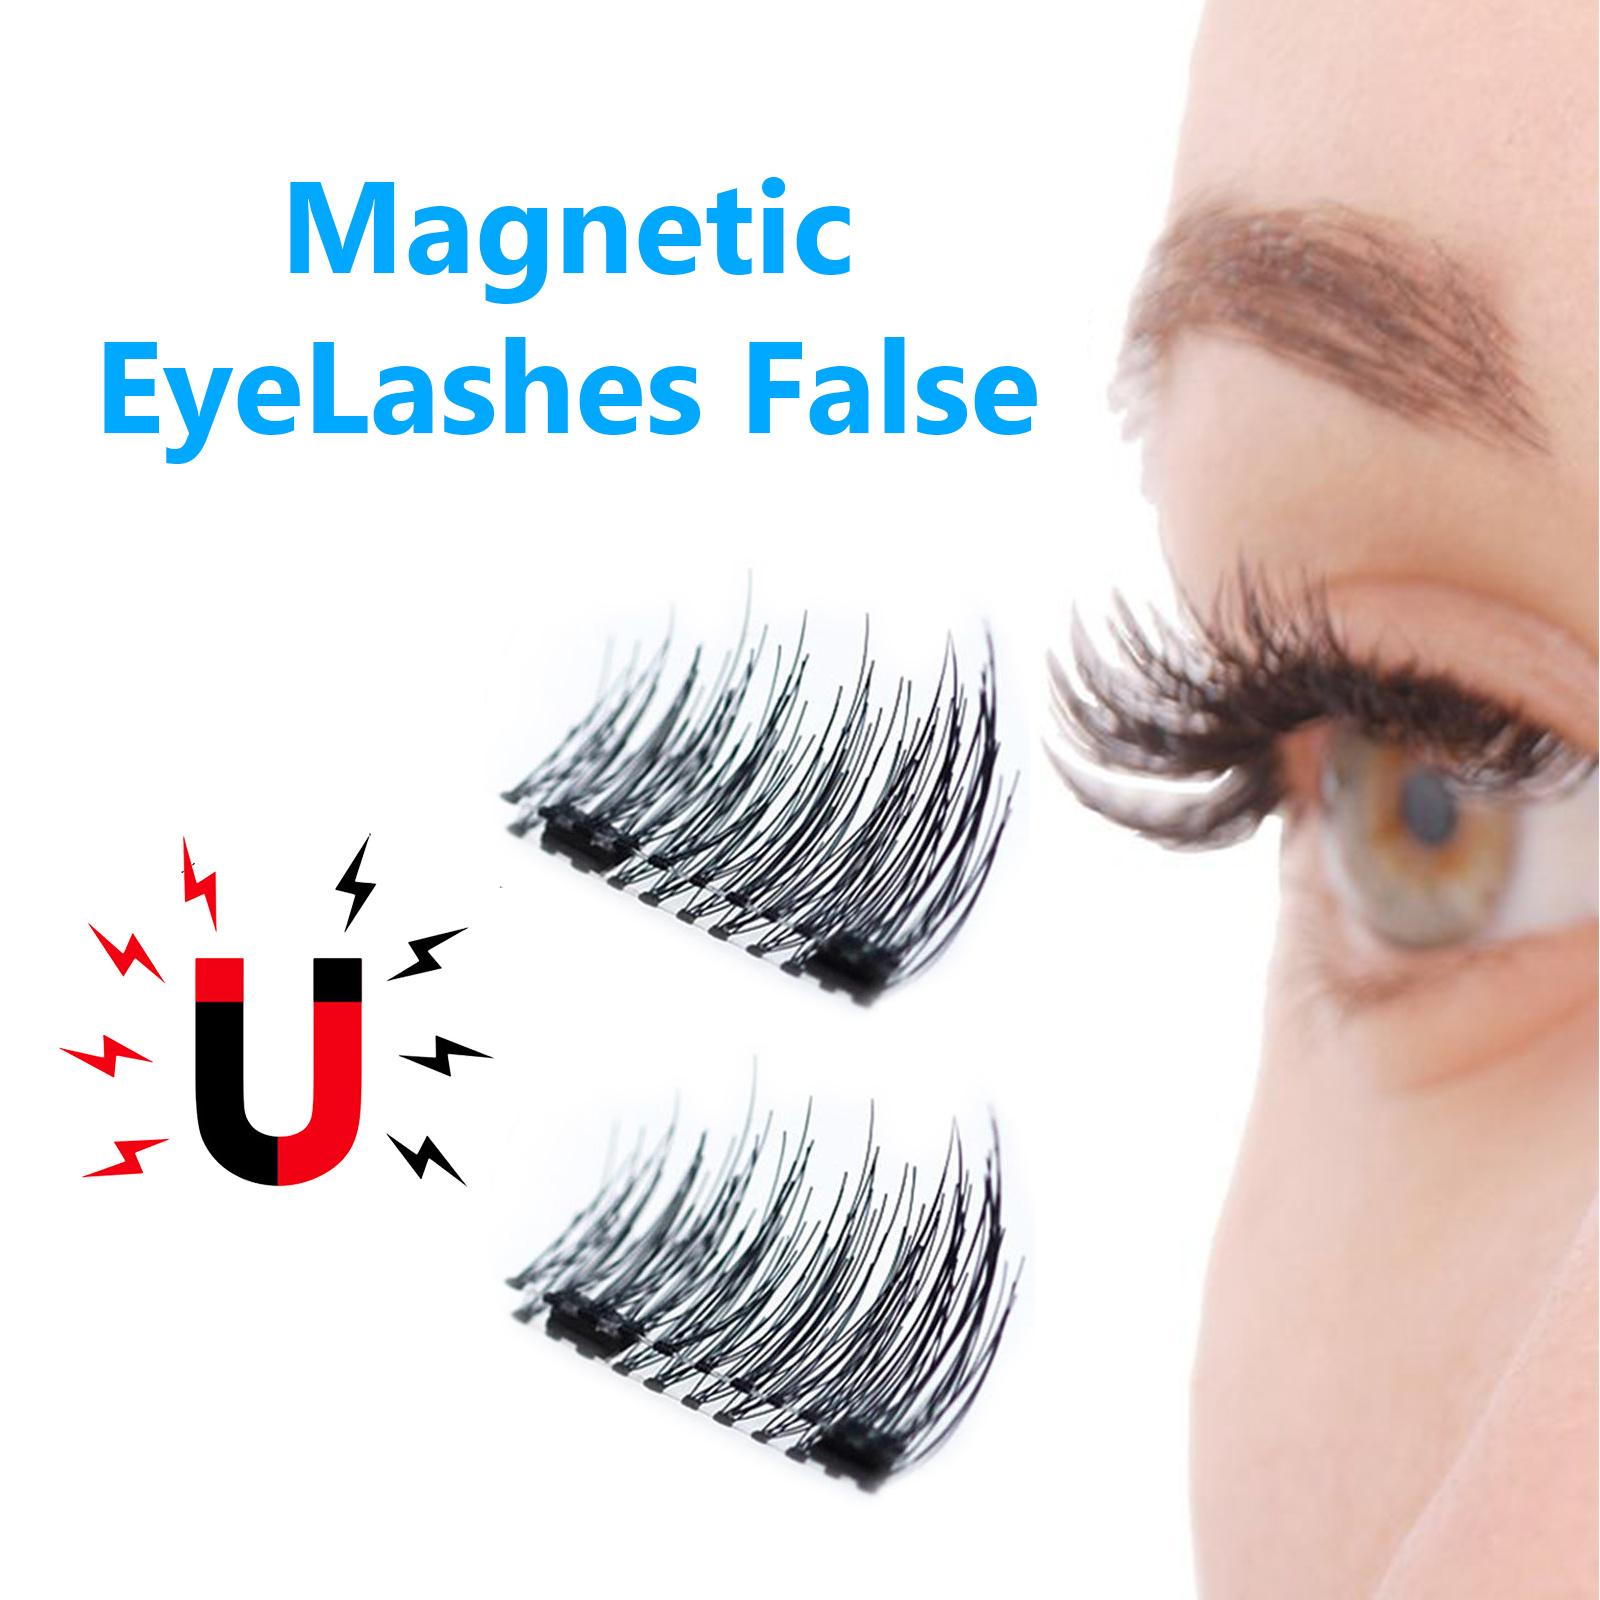 514ab4c1bf5 fit to viewer. prev next. 4Pcs/Pair Magnetic 3D Eyelashes Double Handmade Natural  False Long Eye Lash Reusable